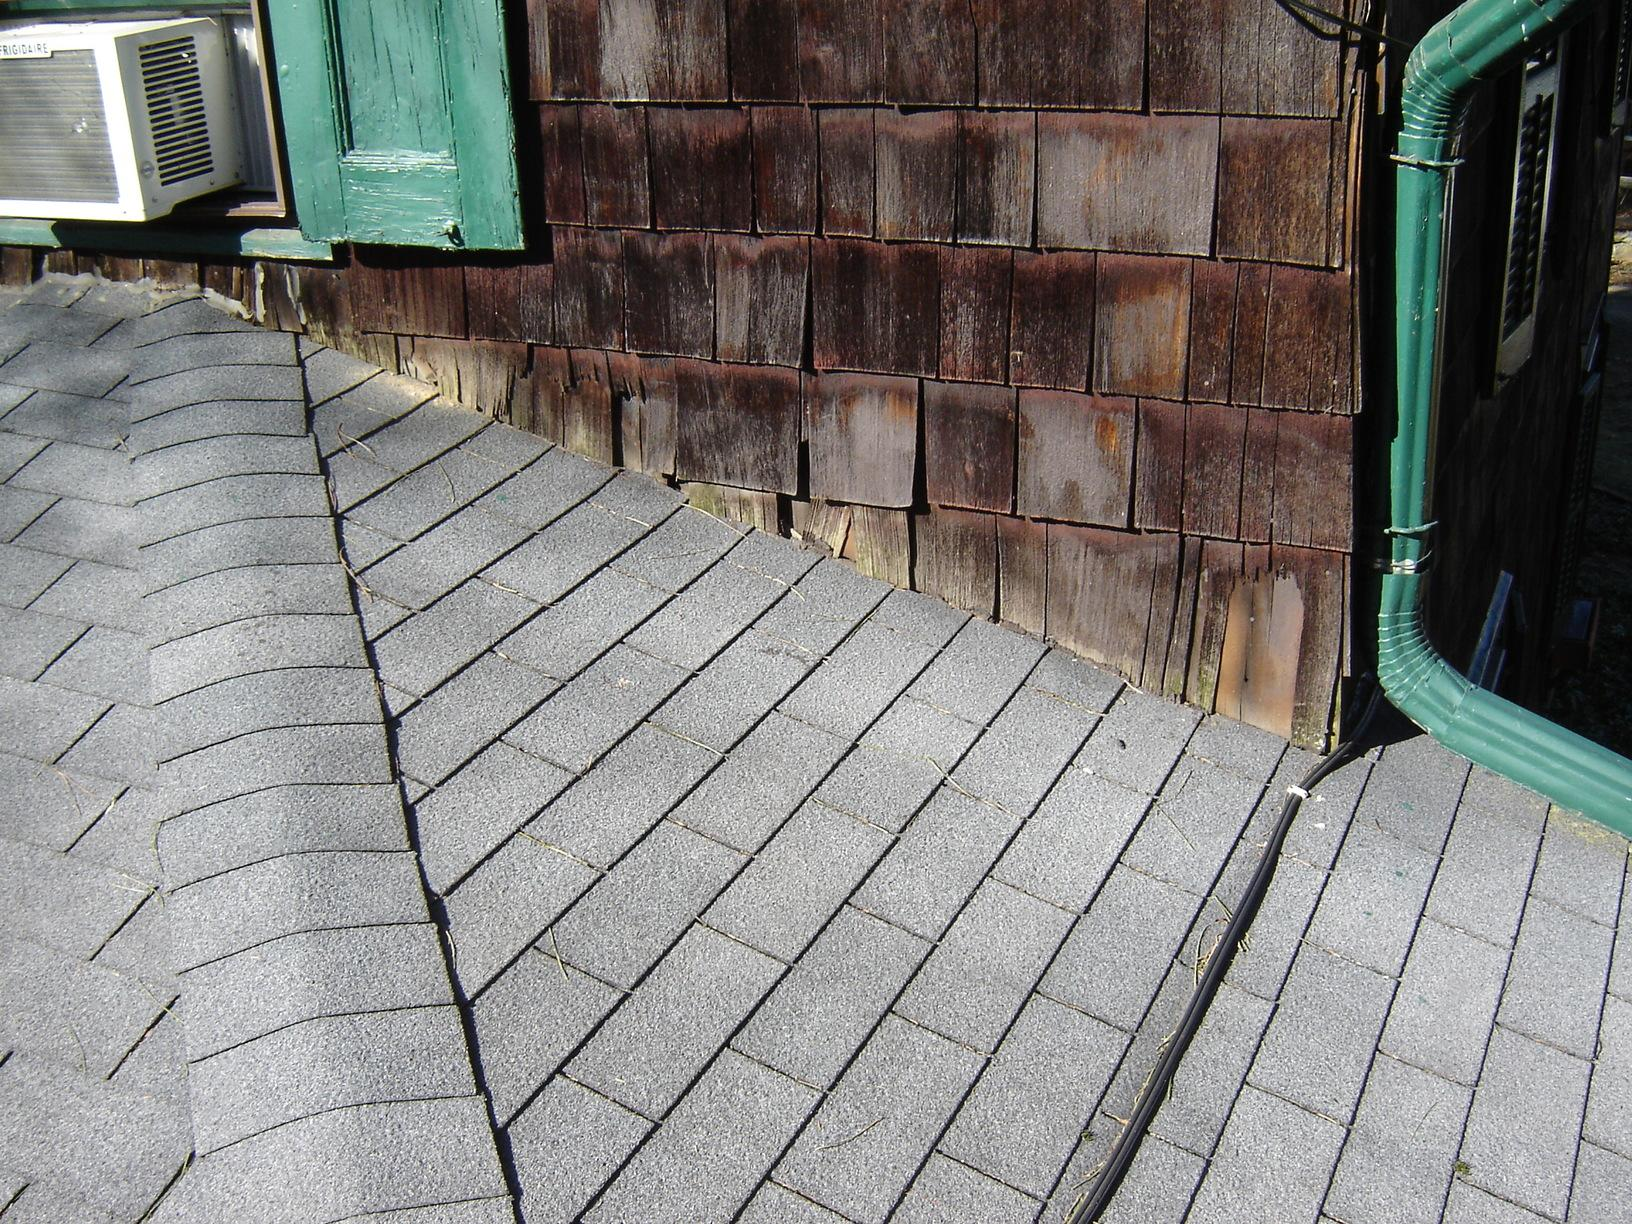 Replacing Asphalt Roof with Metal